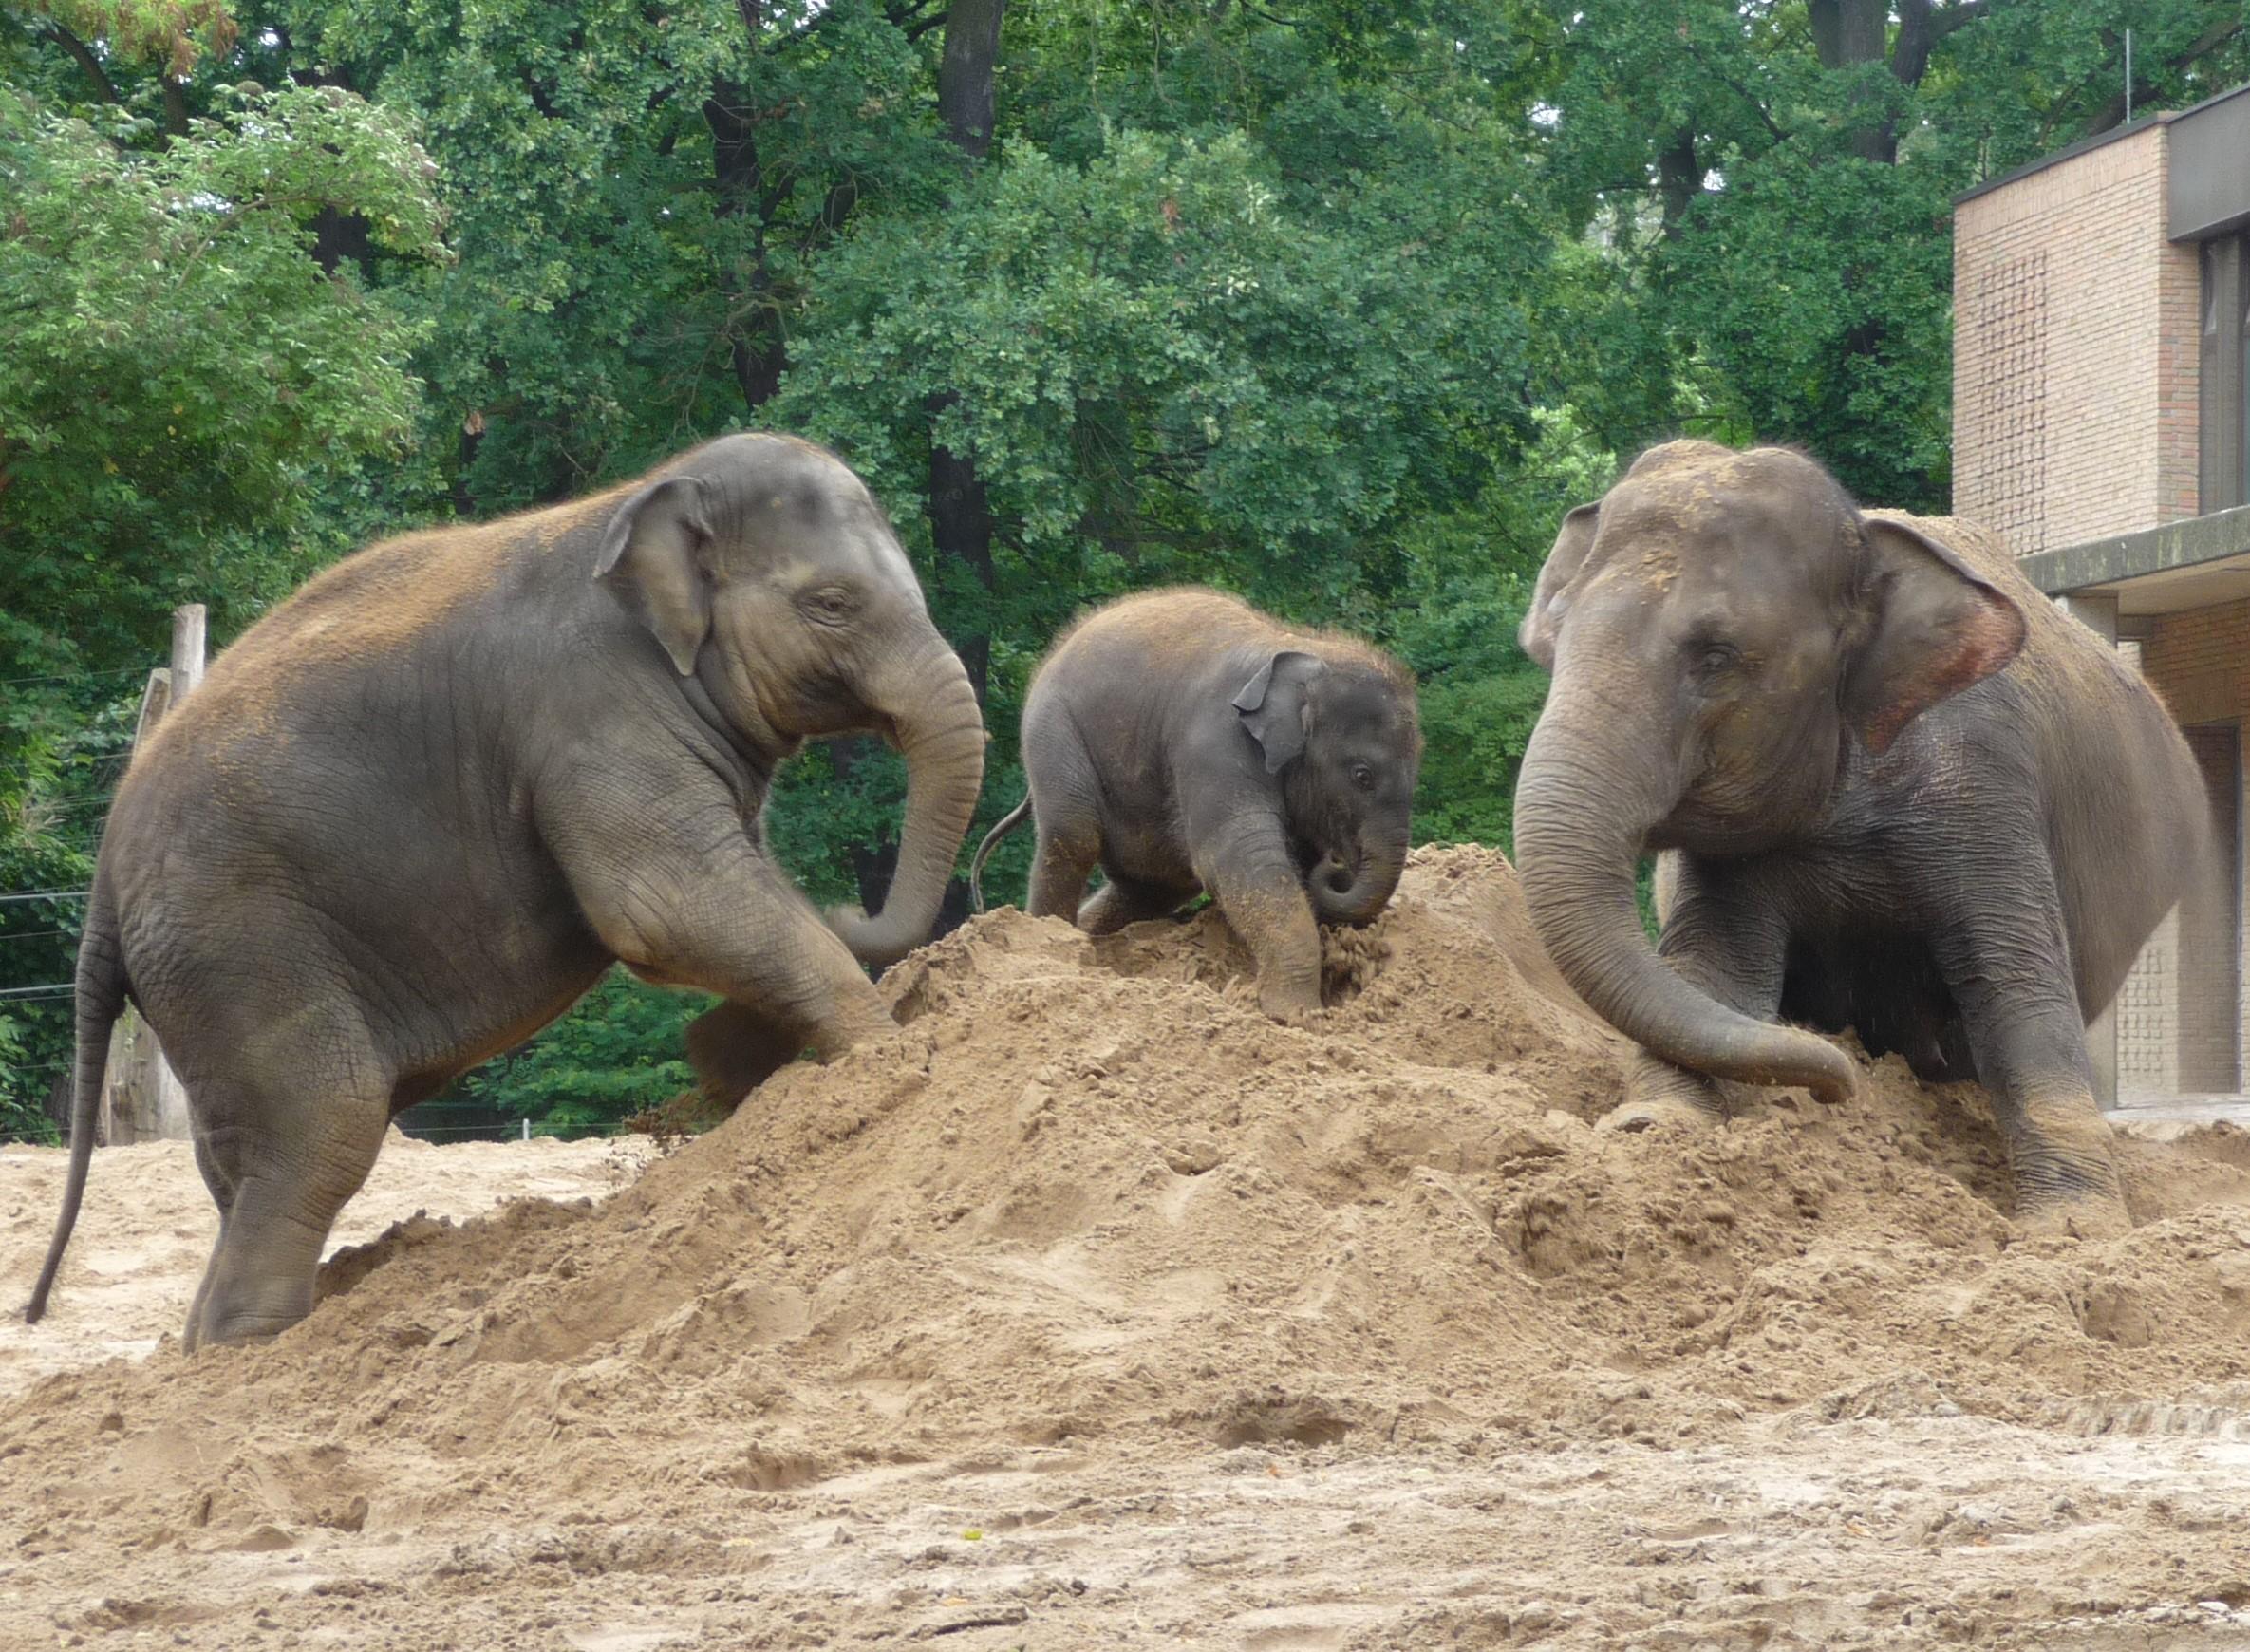 Elefanten im Zoo_Archiv EEG